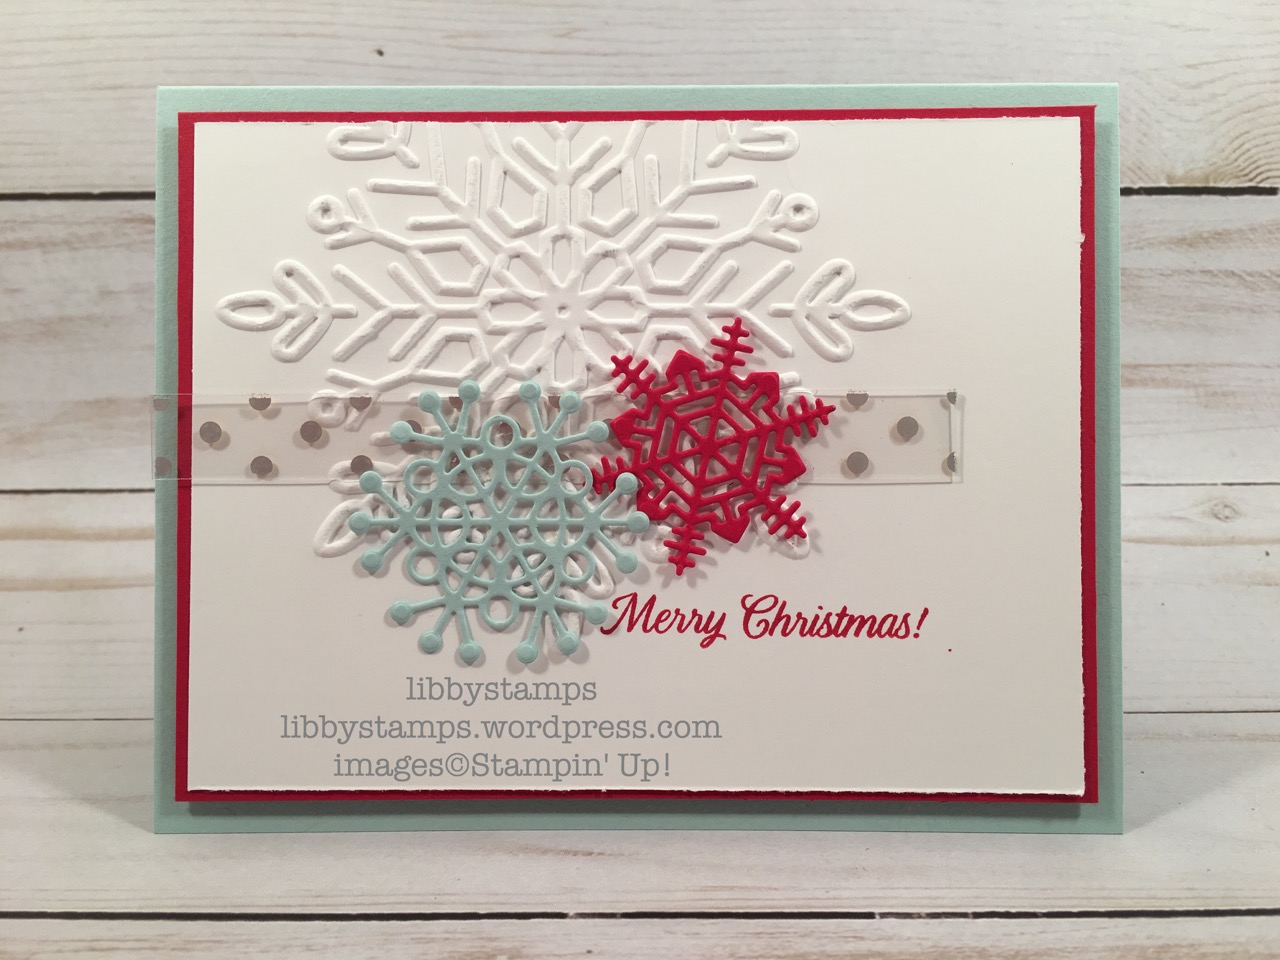 libbystamps, stampin up, Merry Patterns, Seasonal LayersThinlits, Fabulous Foil Designer Acetate, CCMC